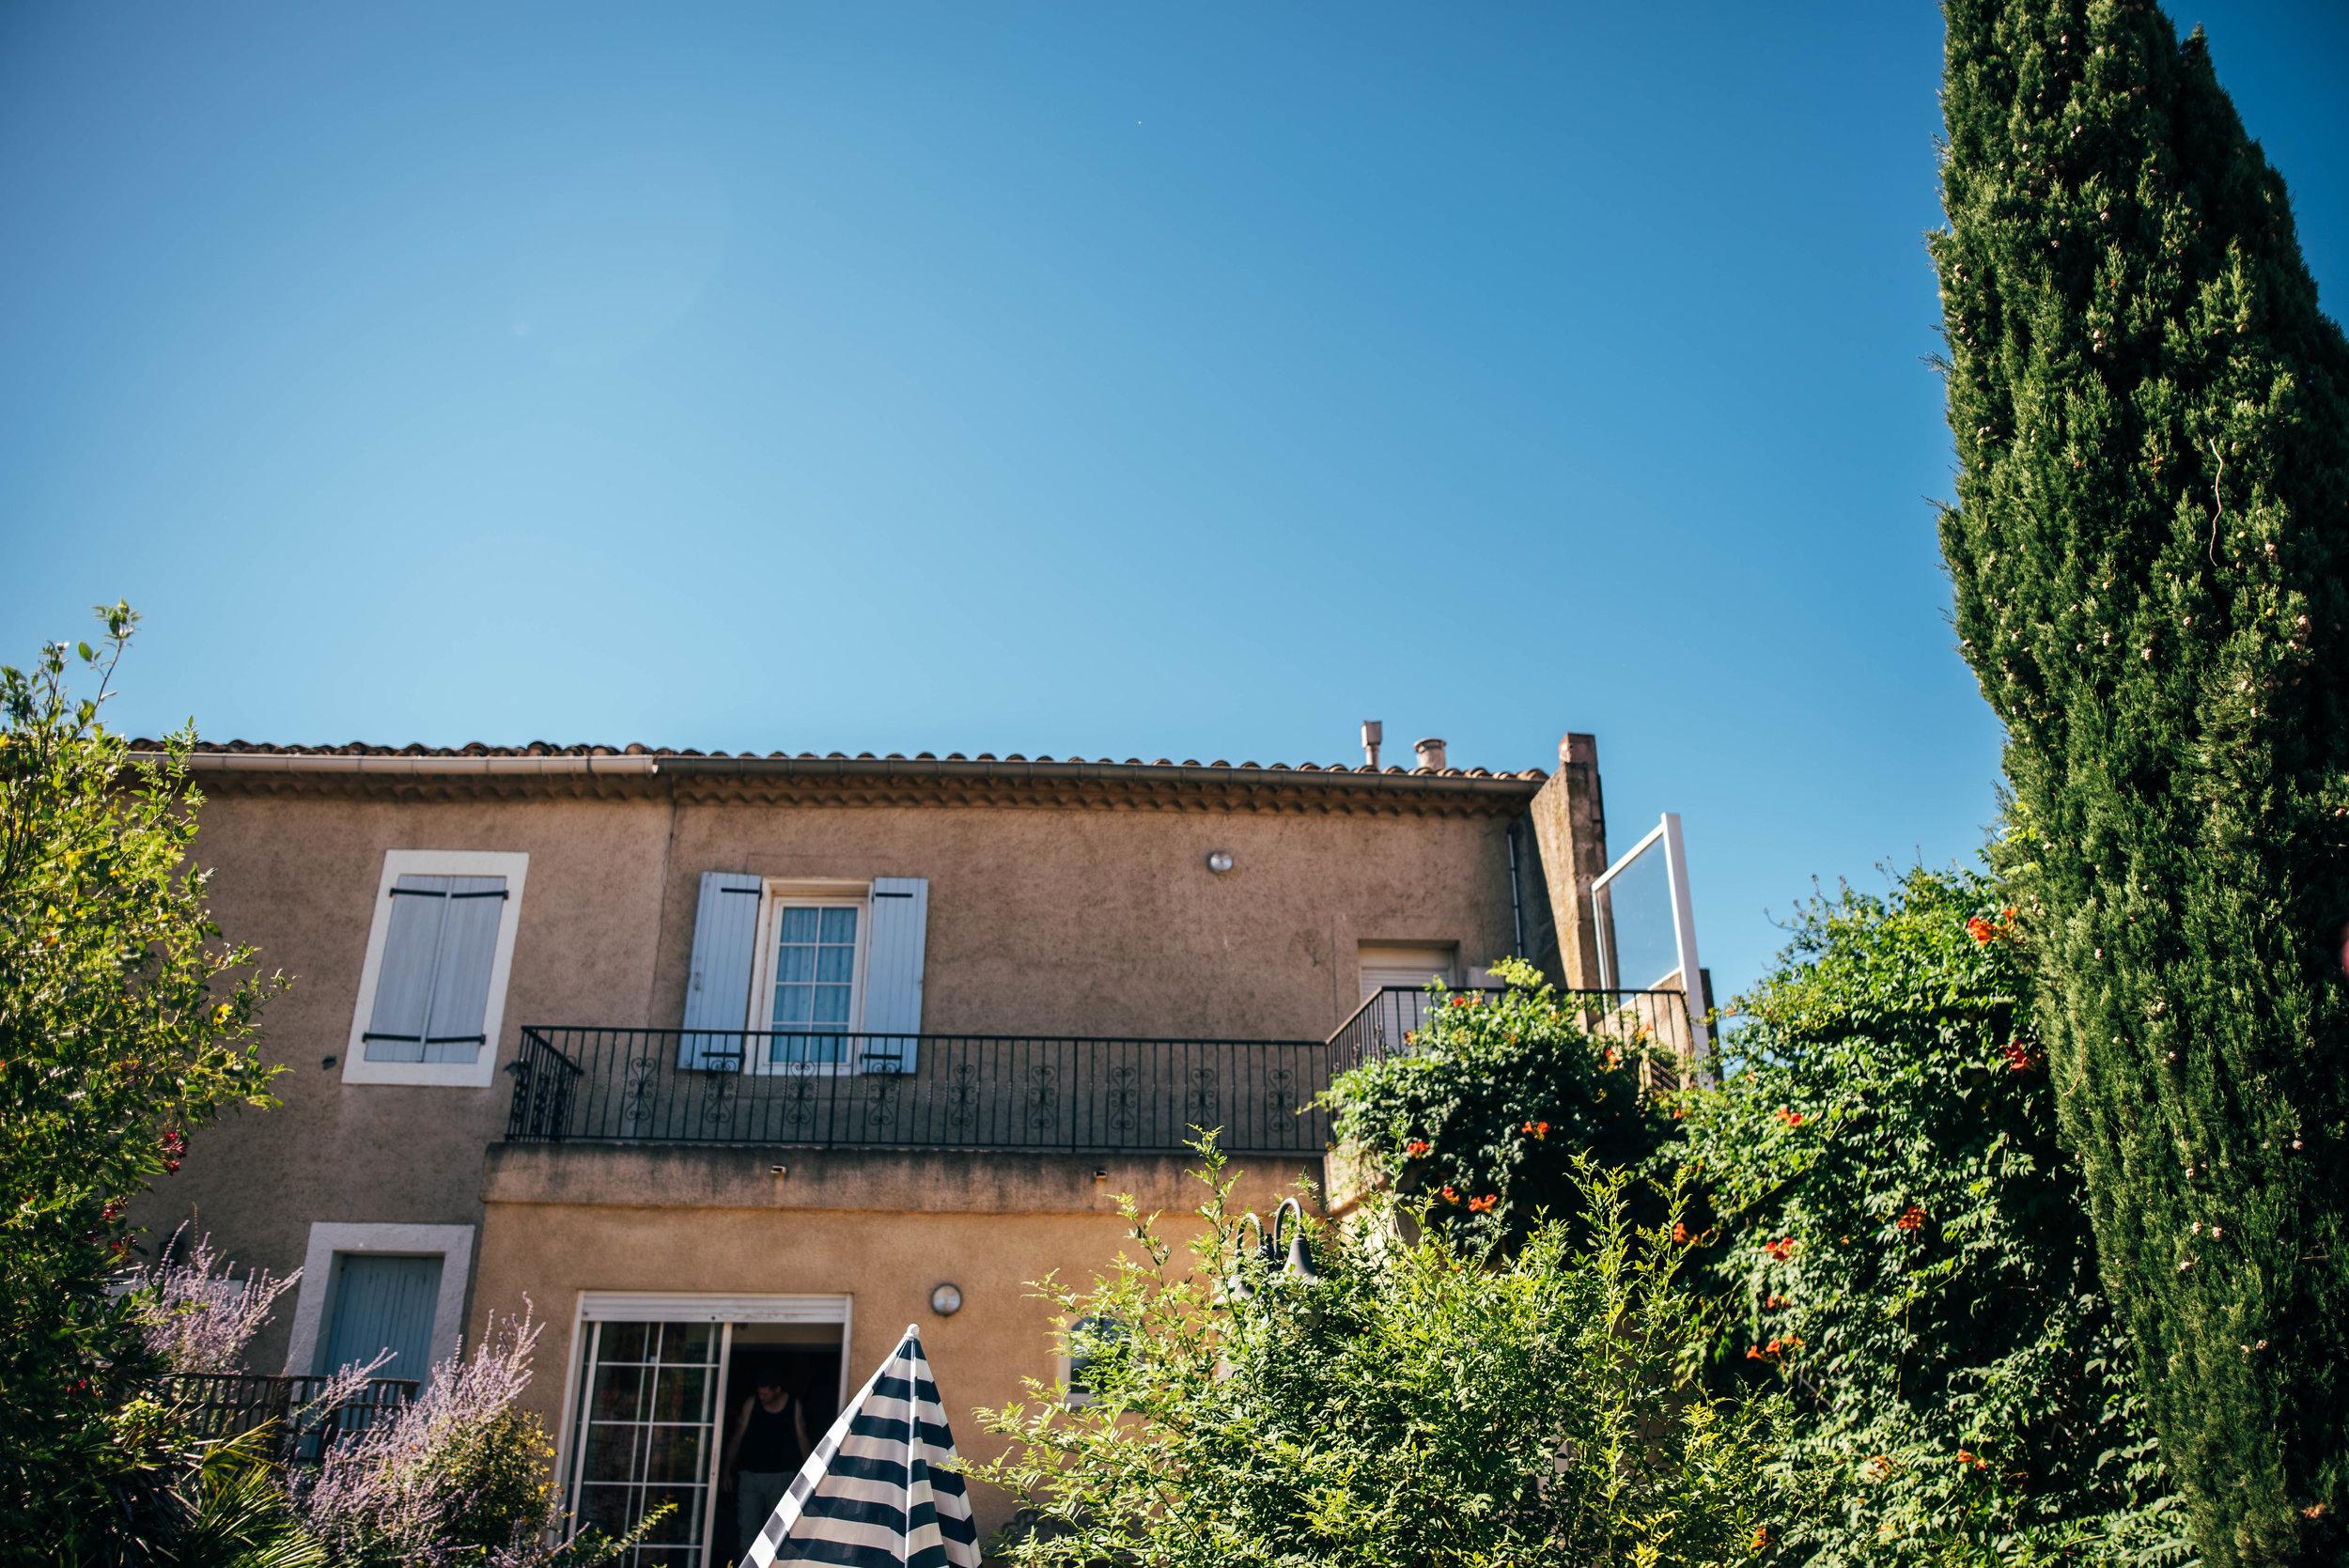 Country villa Carcassonne France Essex UK Documentary Photographer